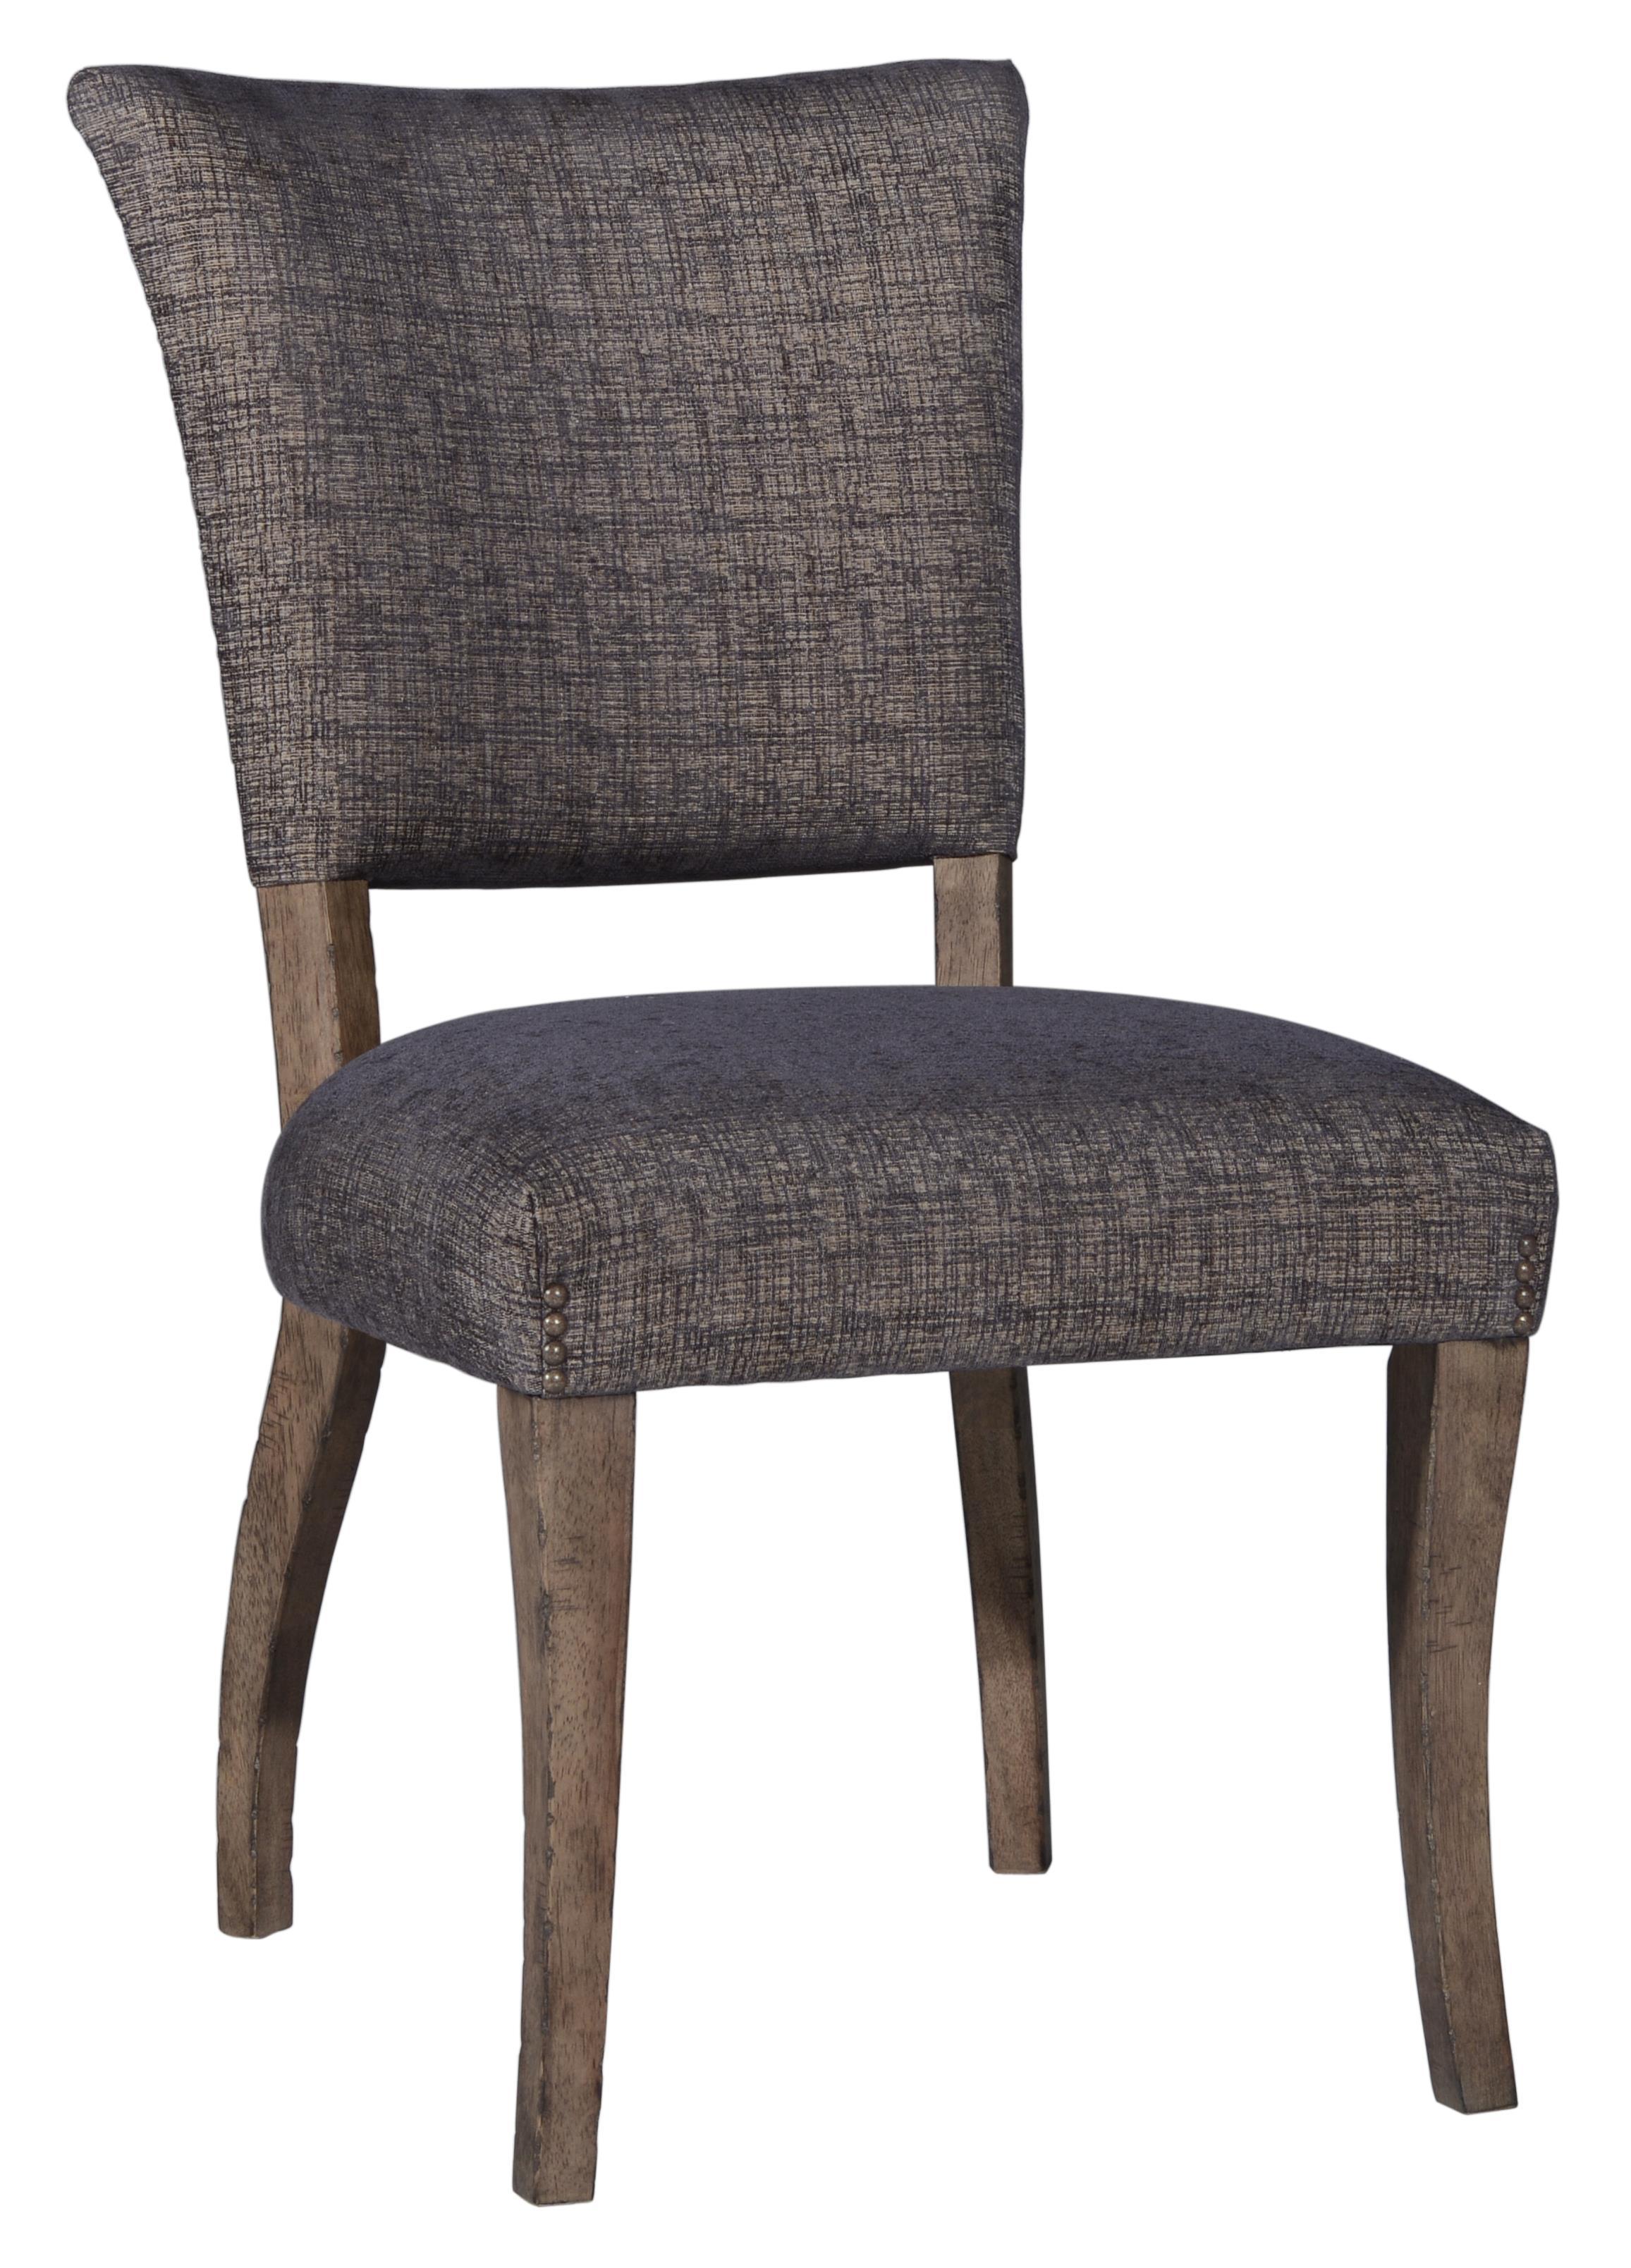 Belfort Signature Urban Treasures Shaw Side Chair - Item Number: 223202-2302